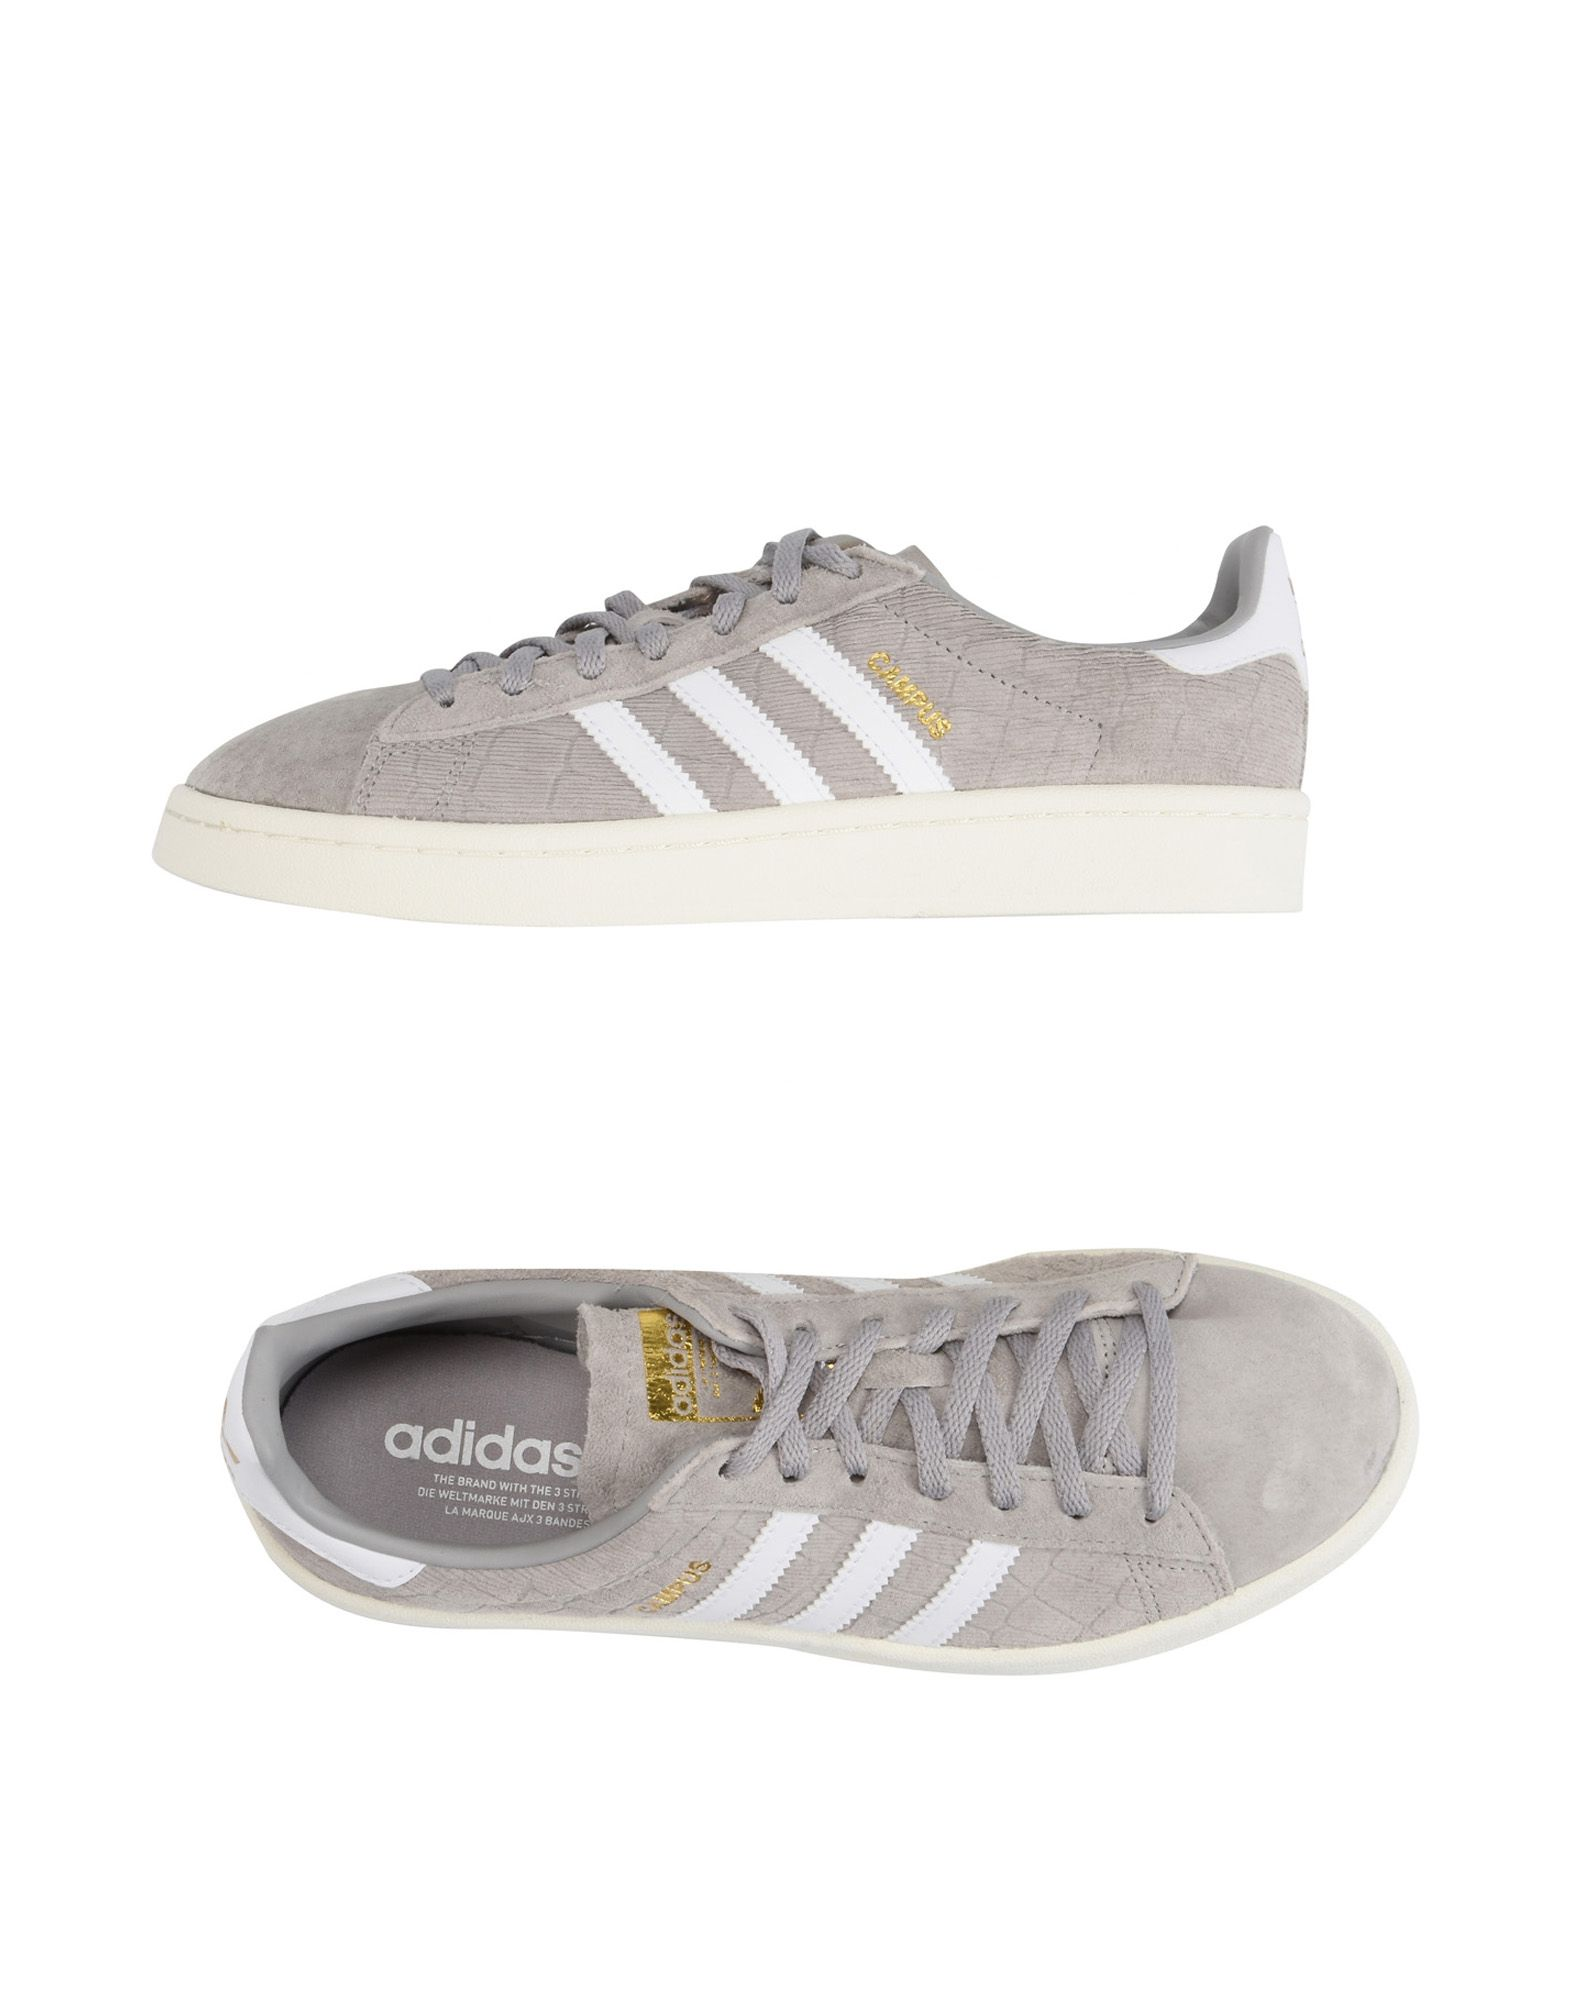 Adidas Originals Campus W - Sneakers - Women Adidas Originals ... a1f9c7edd8